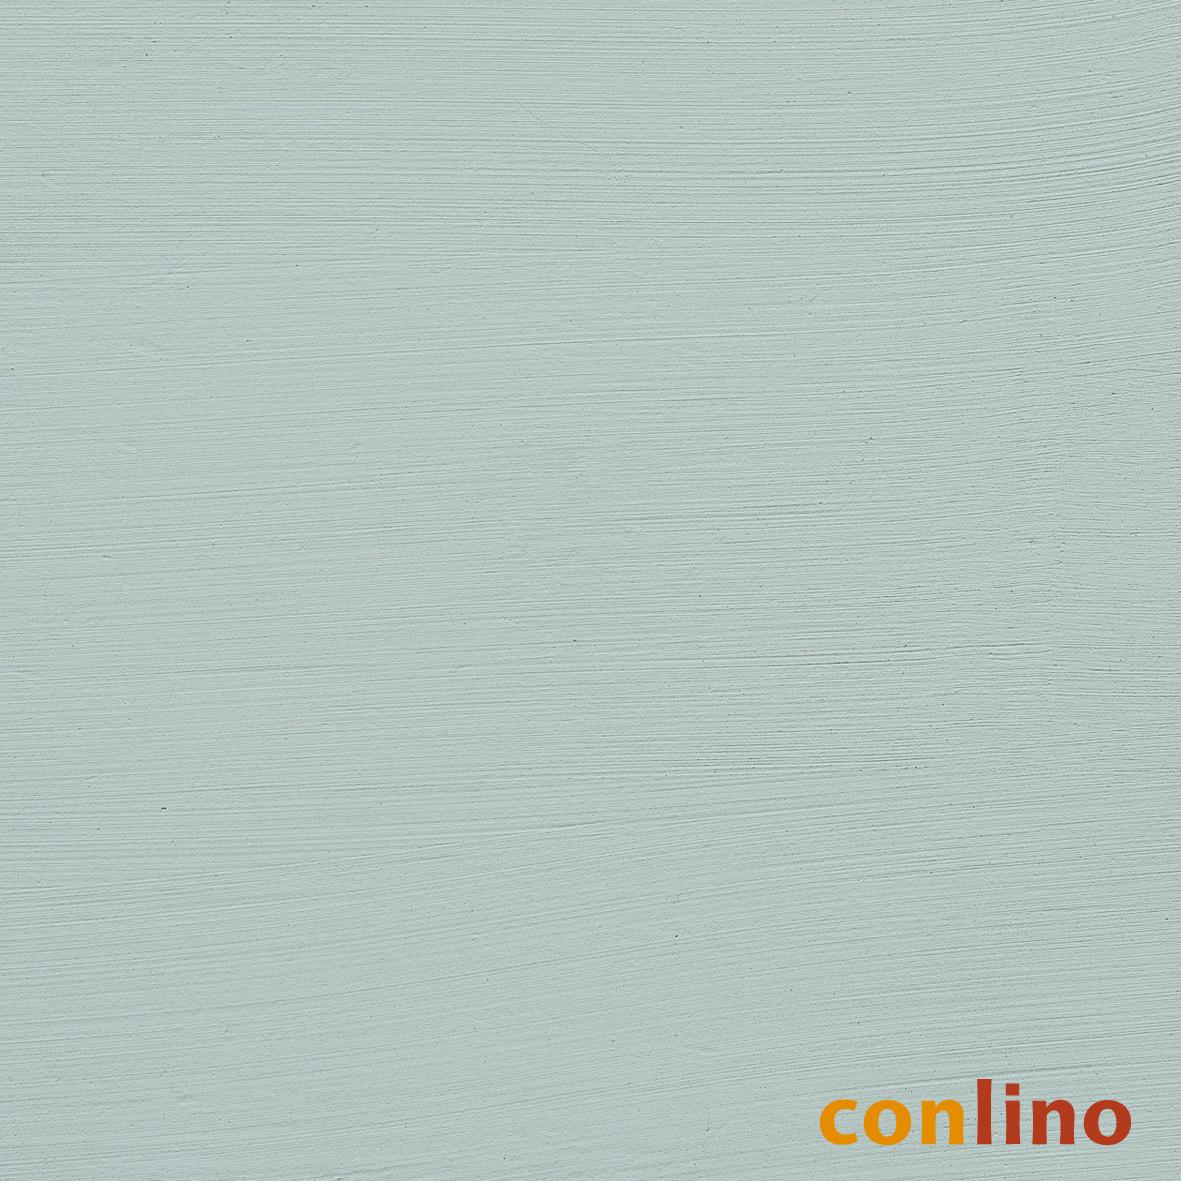 conlino Lehmfarbe Muschel CL 146